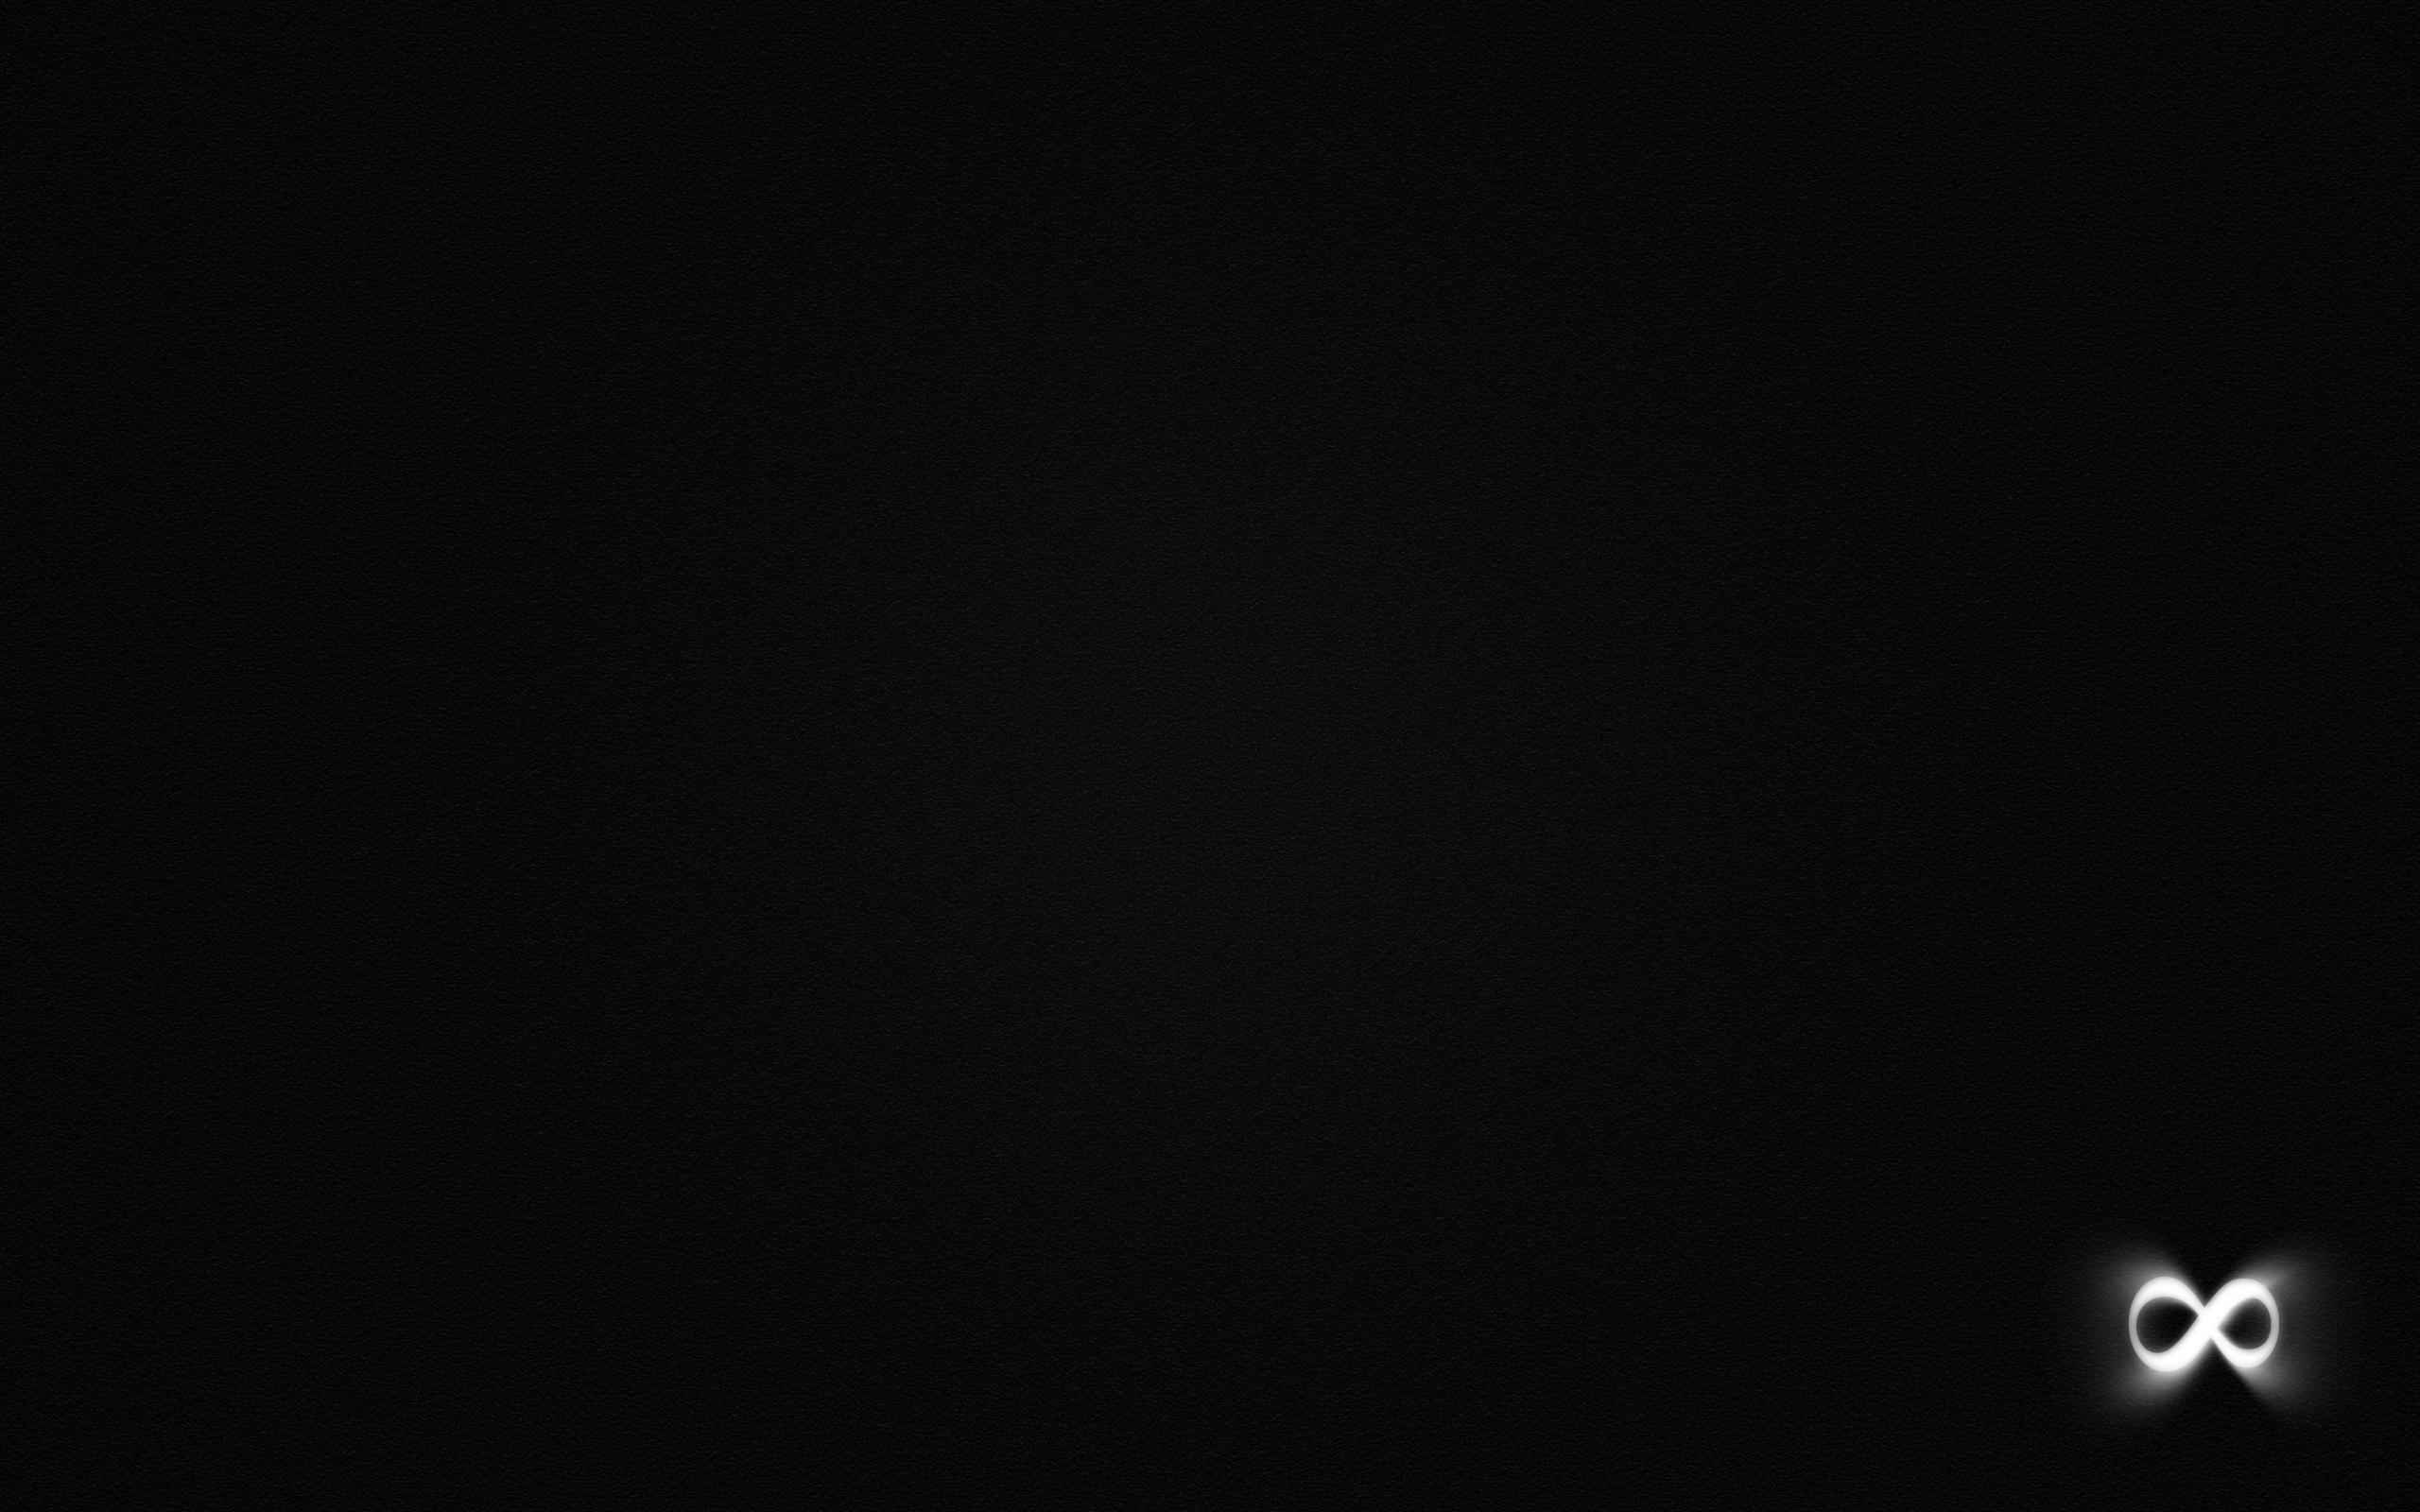 windows infinity desktop background - photo #40